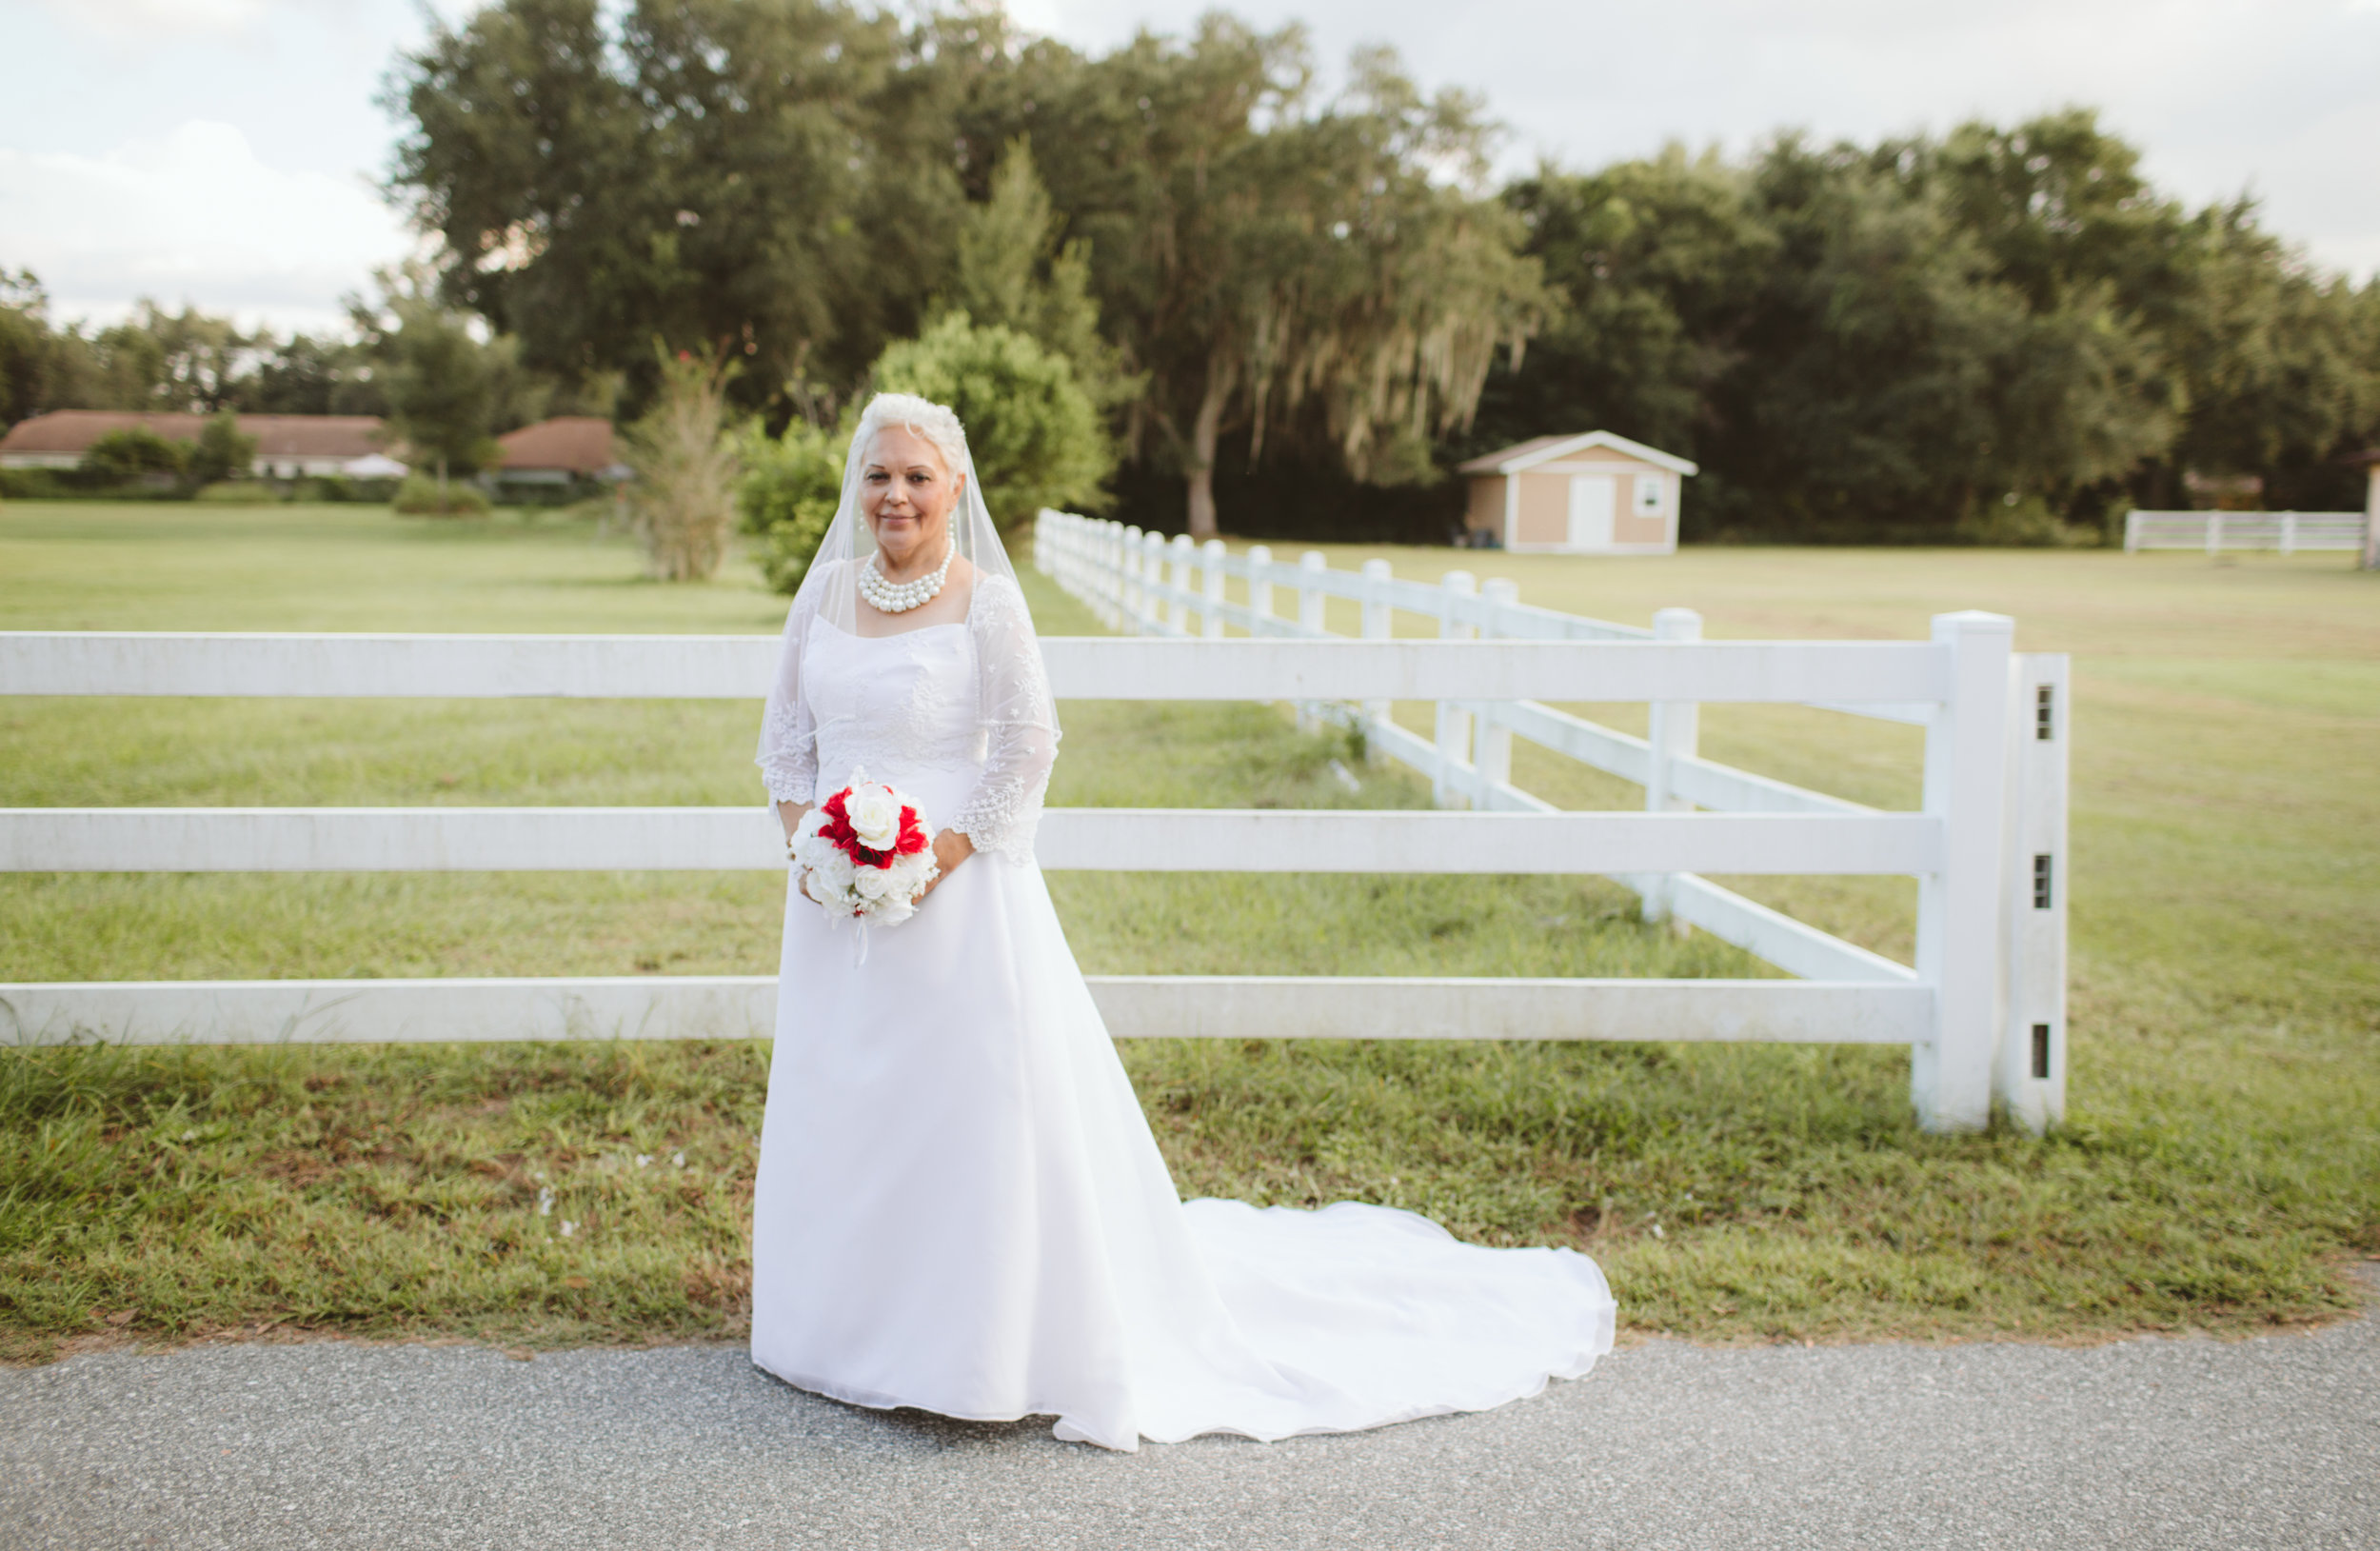 wedding | Vanessa Boy Photography | vanessaboy.com |-213.jpg